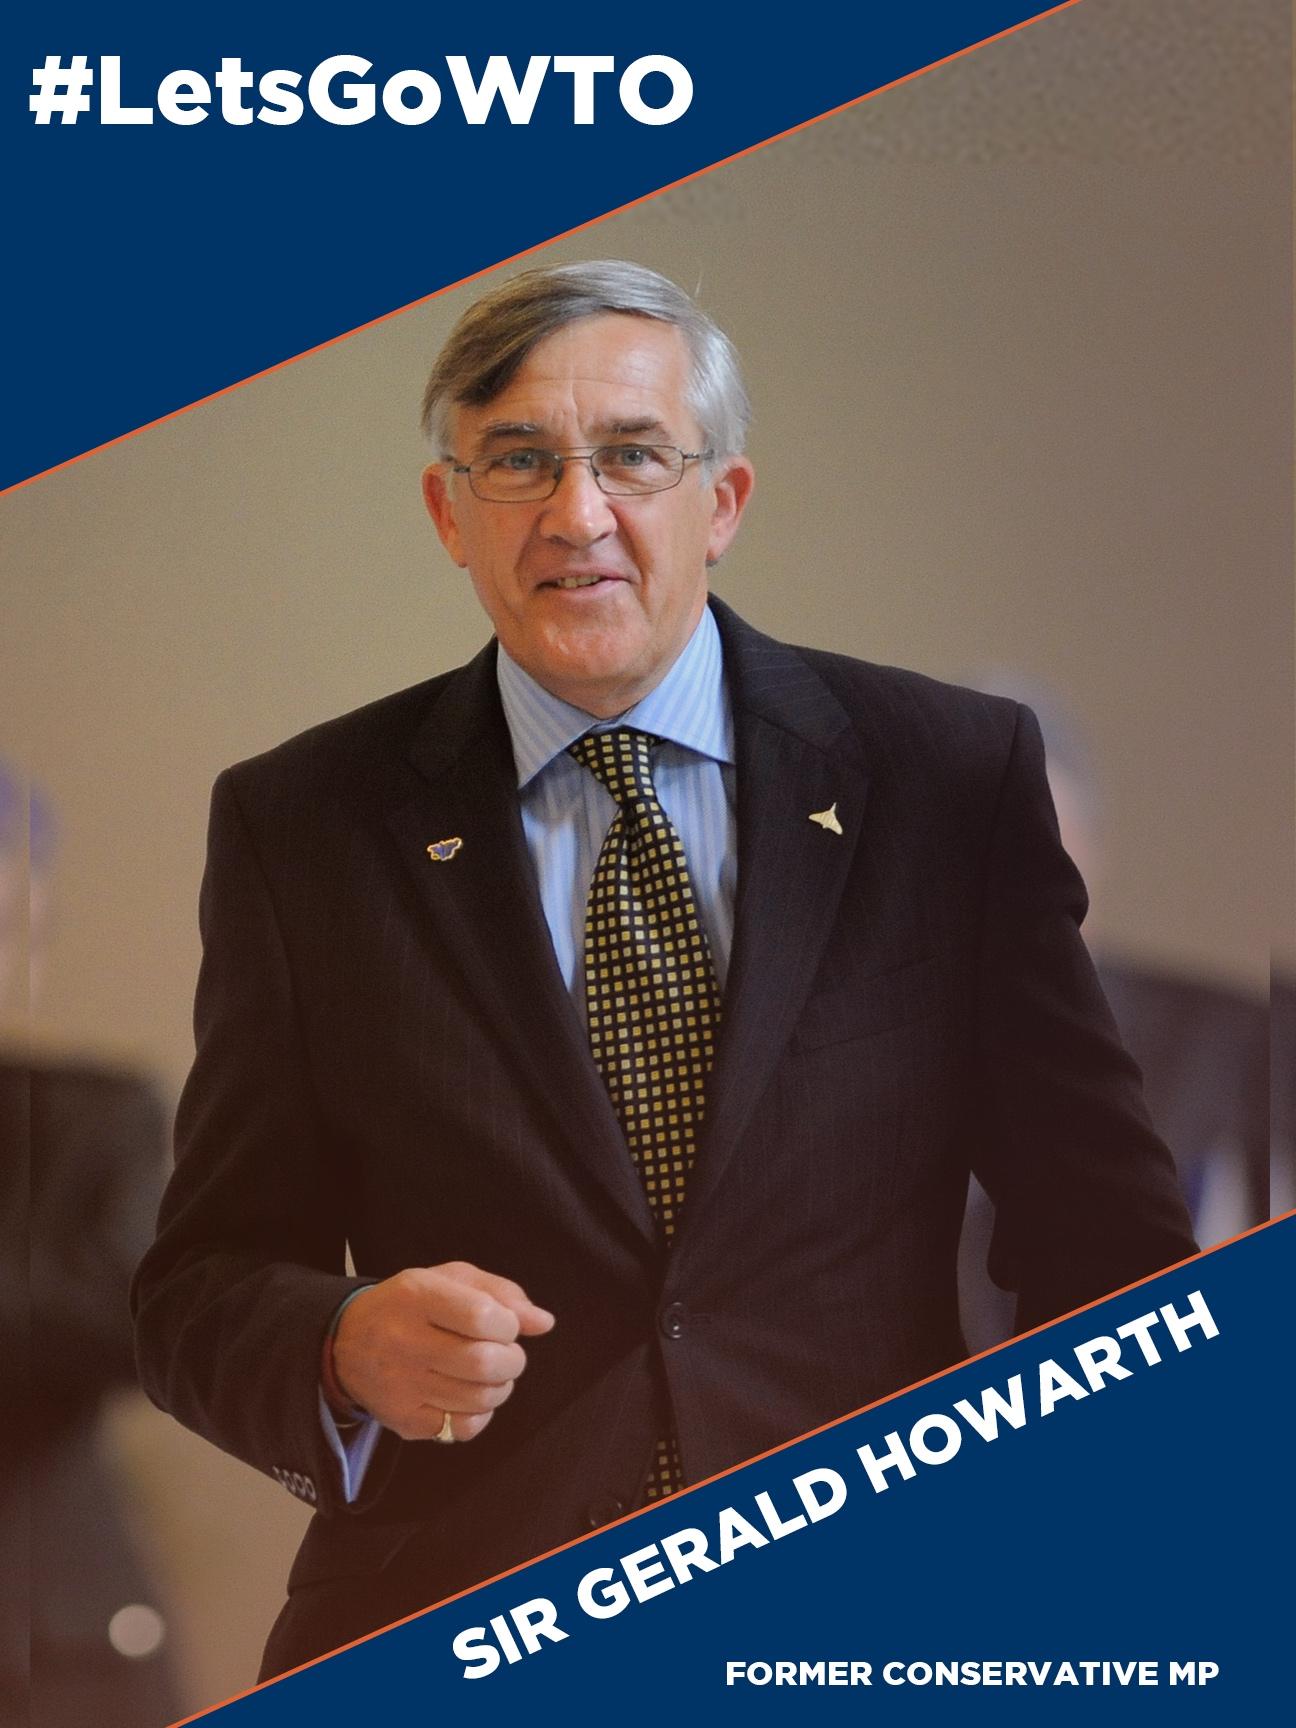 Howarth+portrait.jpg